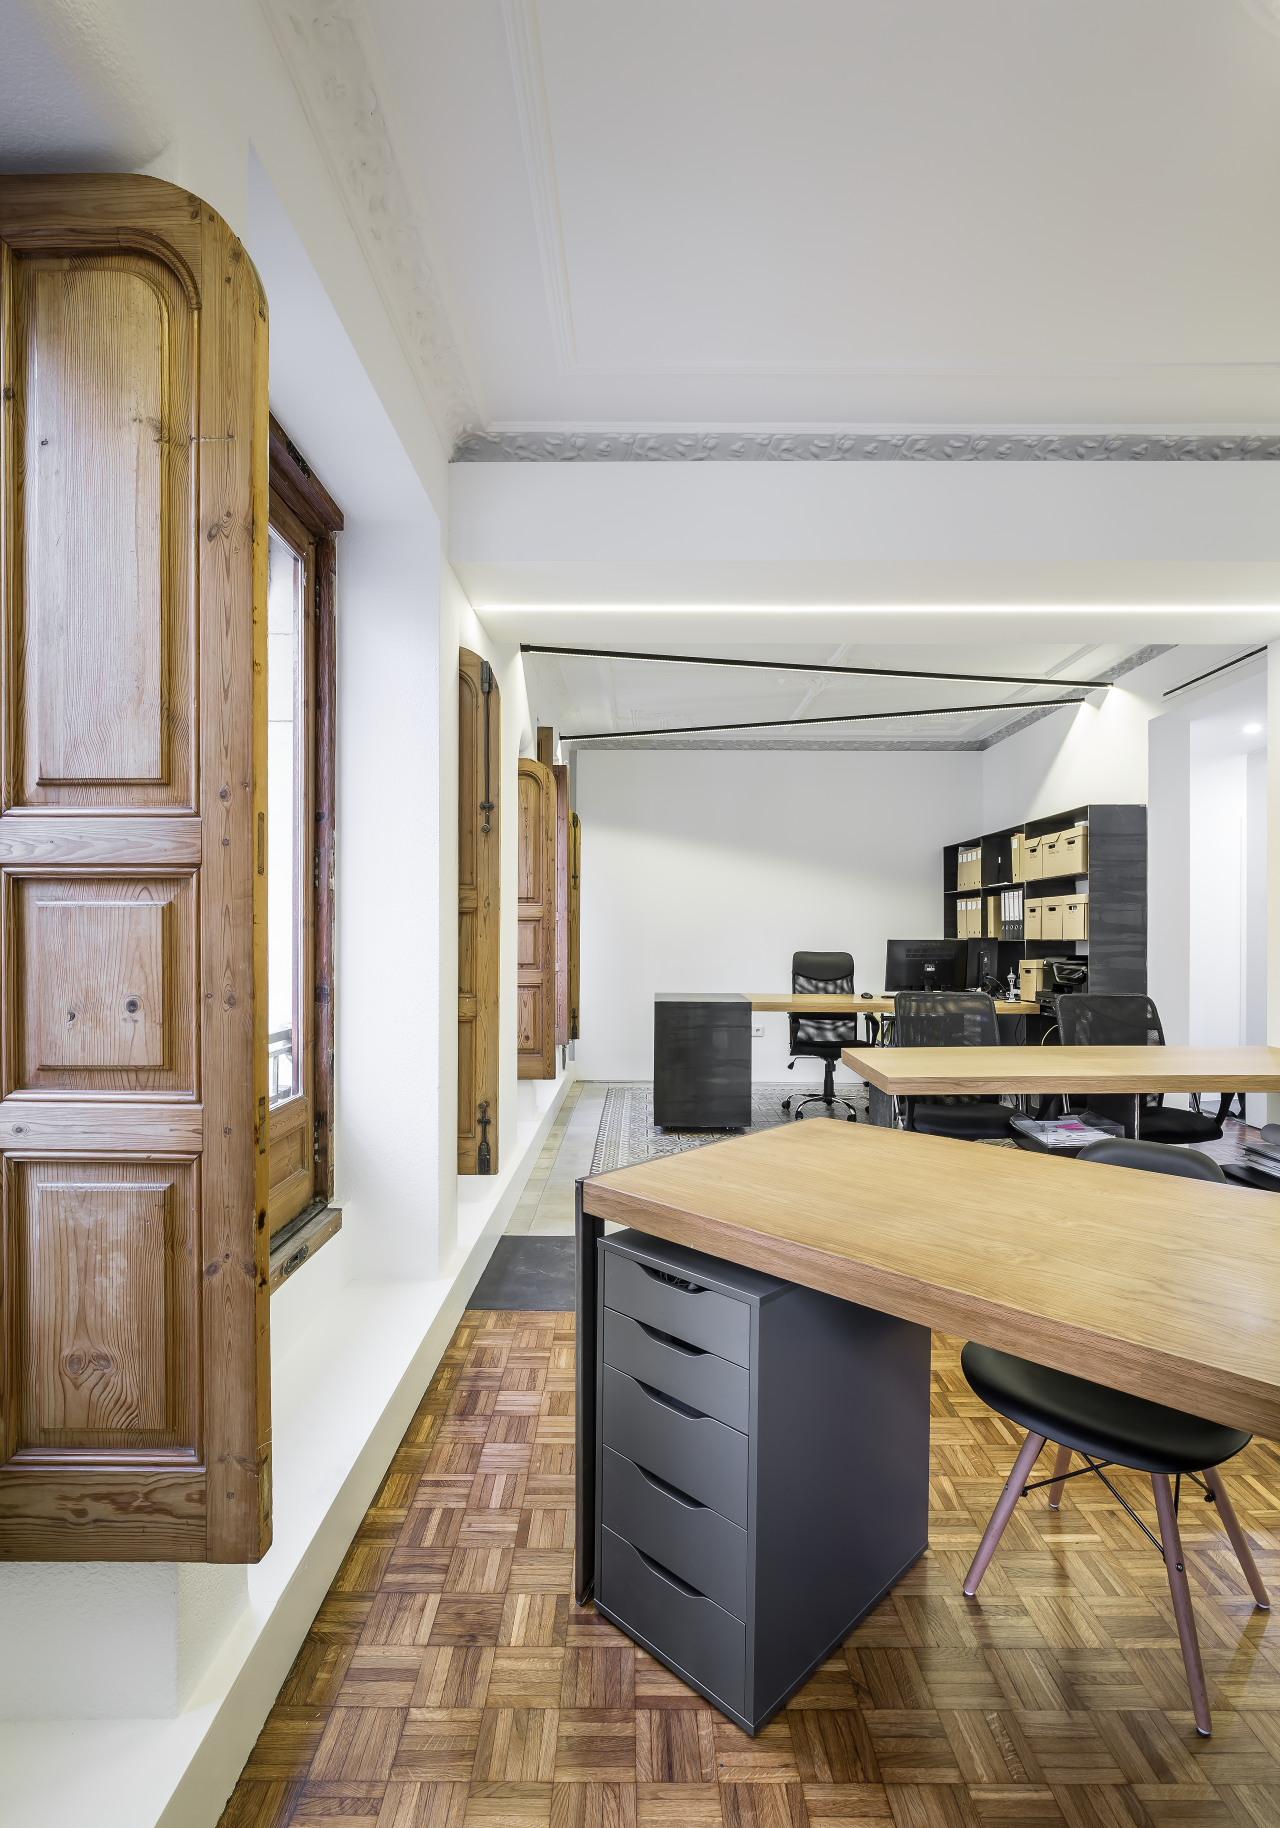 fotografia-arquitectura-interiorismo-valencia-german-cabo-viraje-estudio-pujol (8)